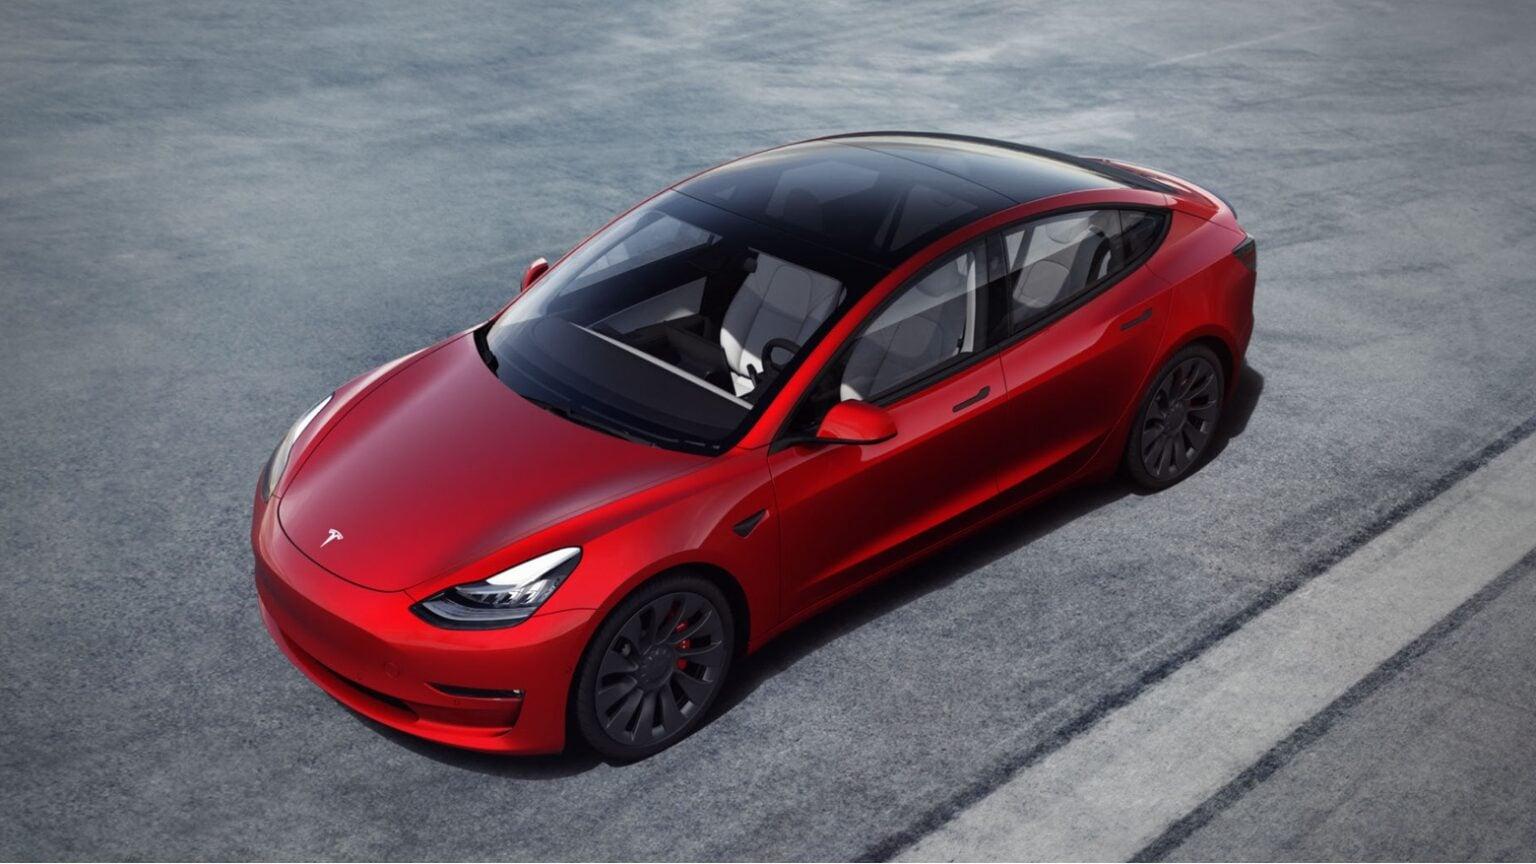 The Tesla Model 3 is the company's sedan